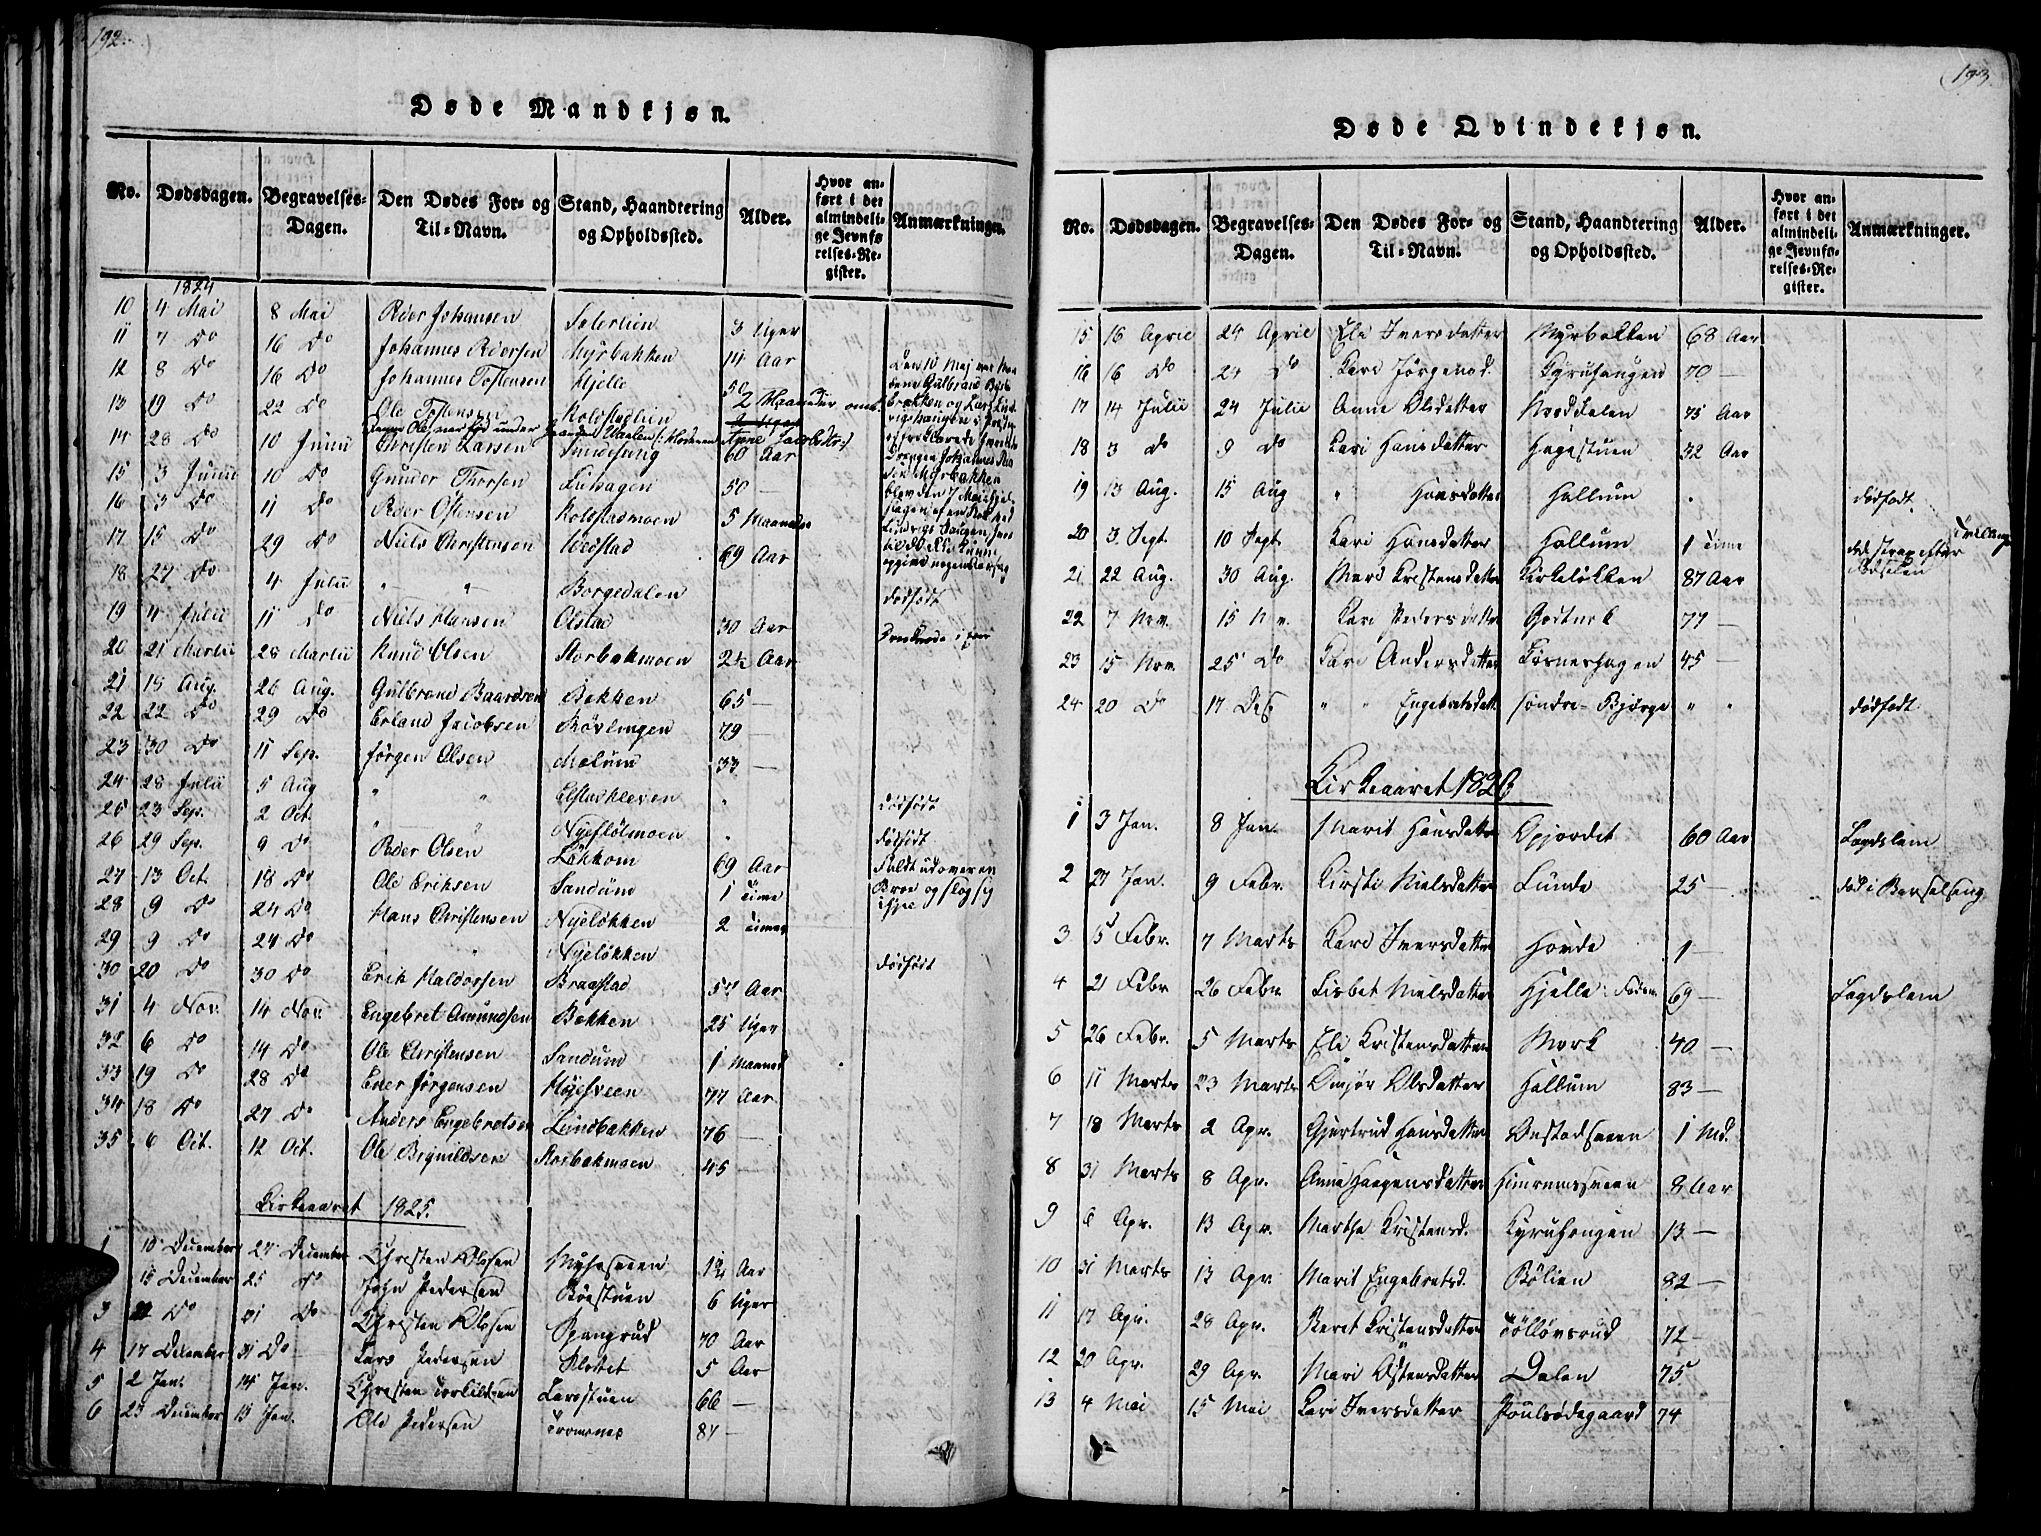 SAH, Ringebu prestekontor, Ministerialbok nr. 4, 1821-1839, s. 192-193